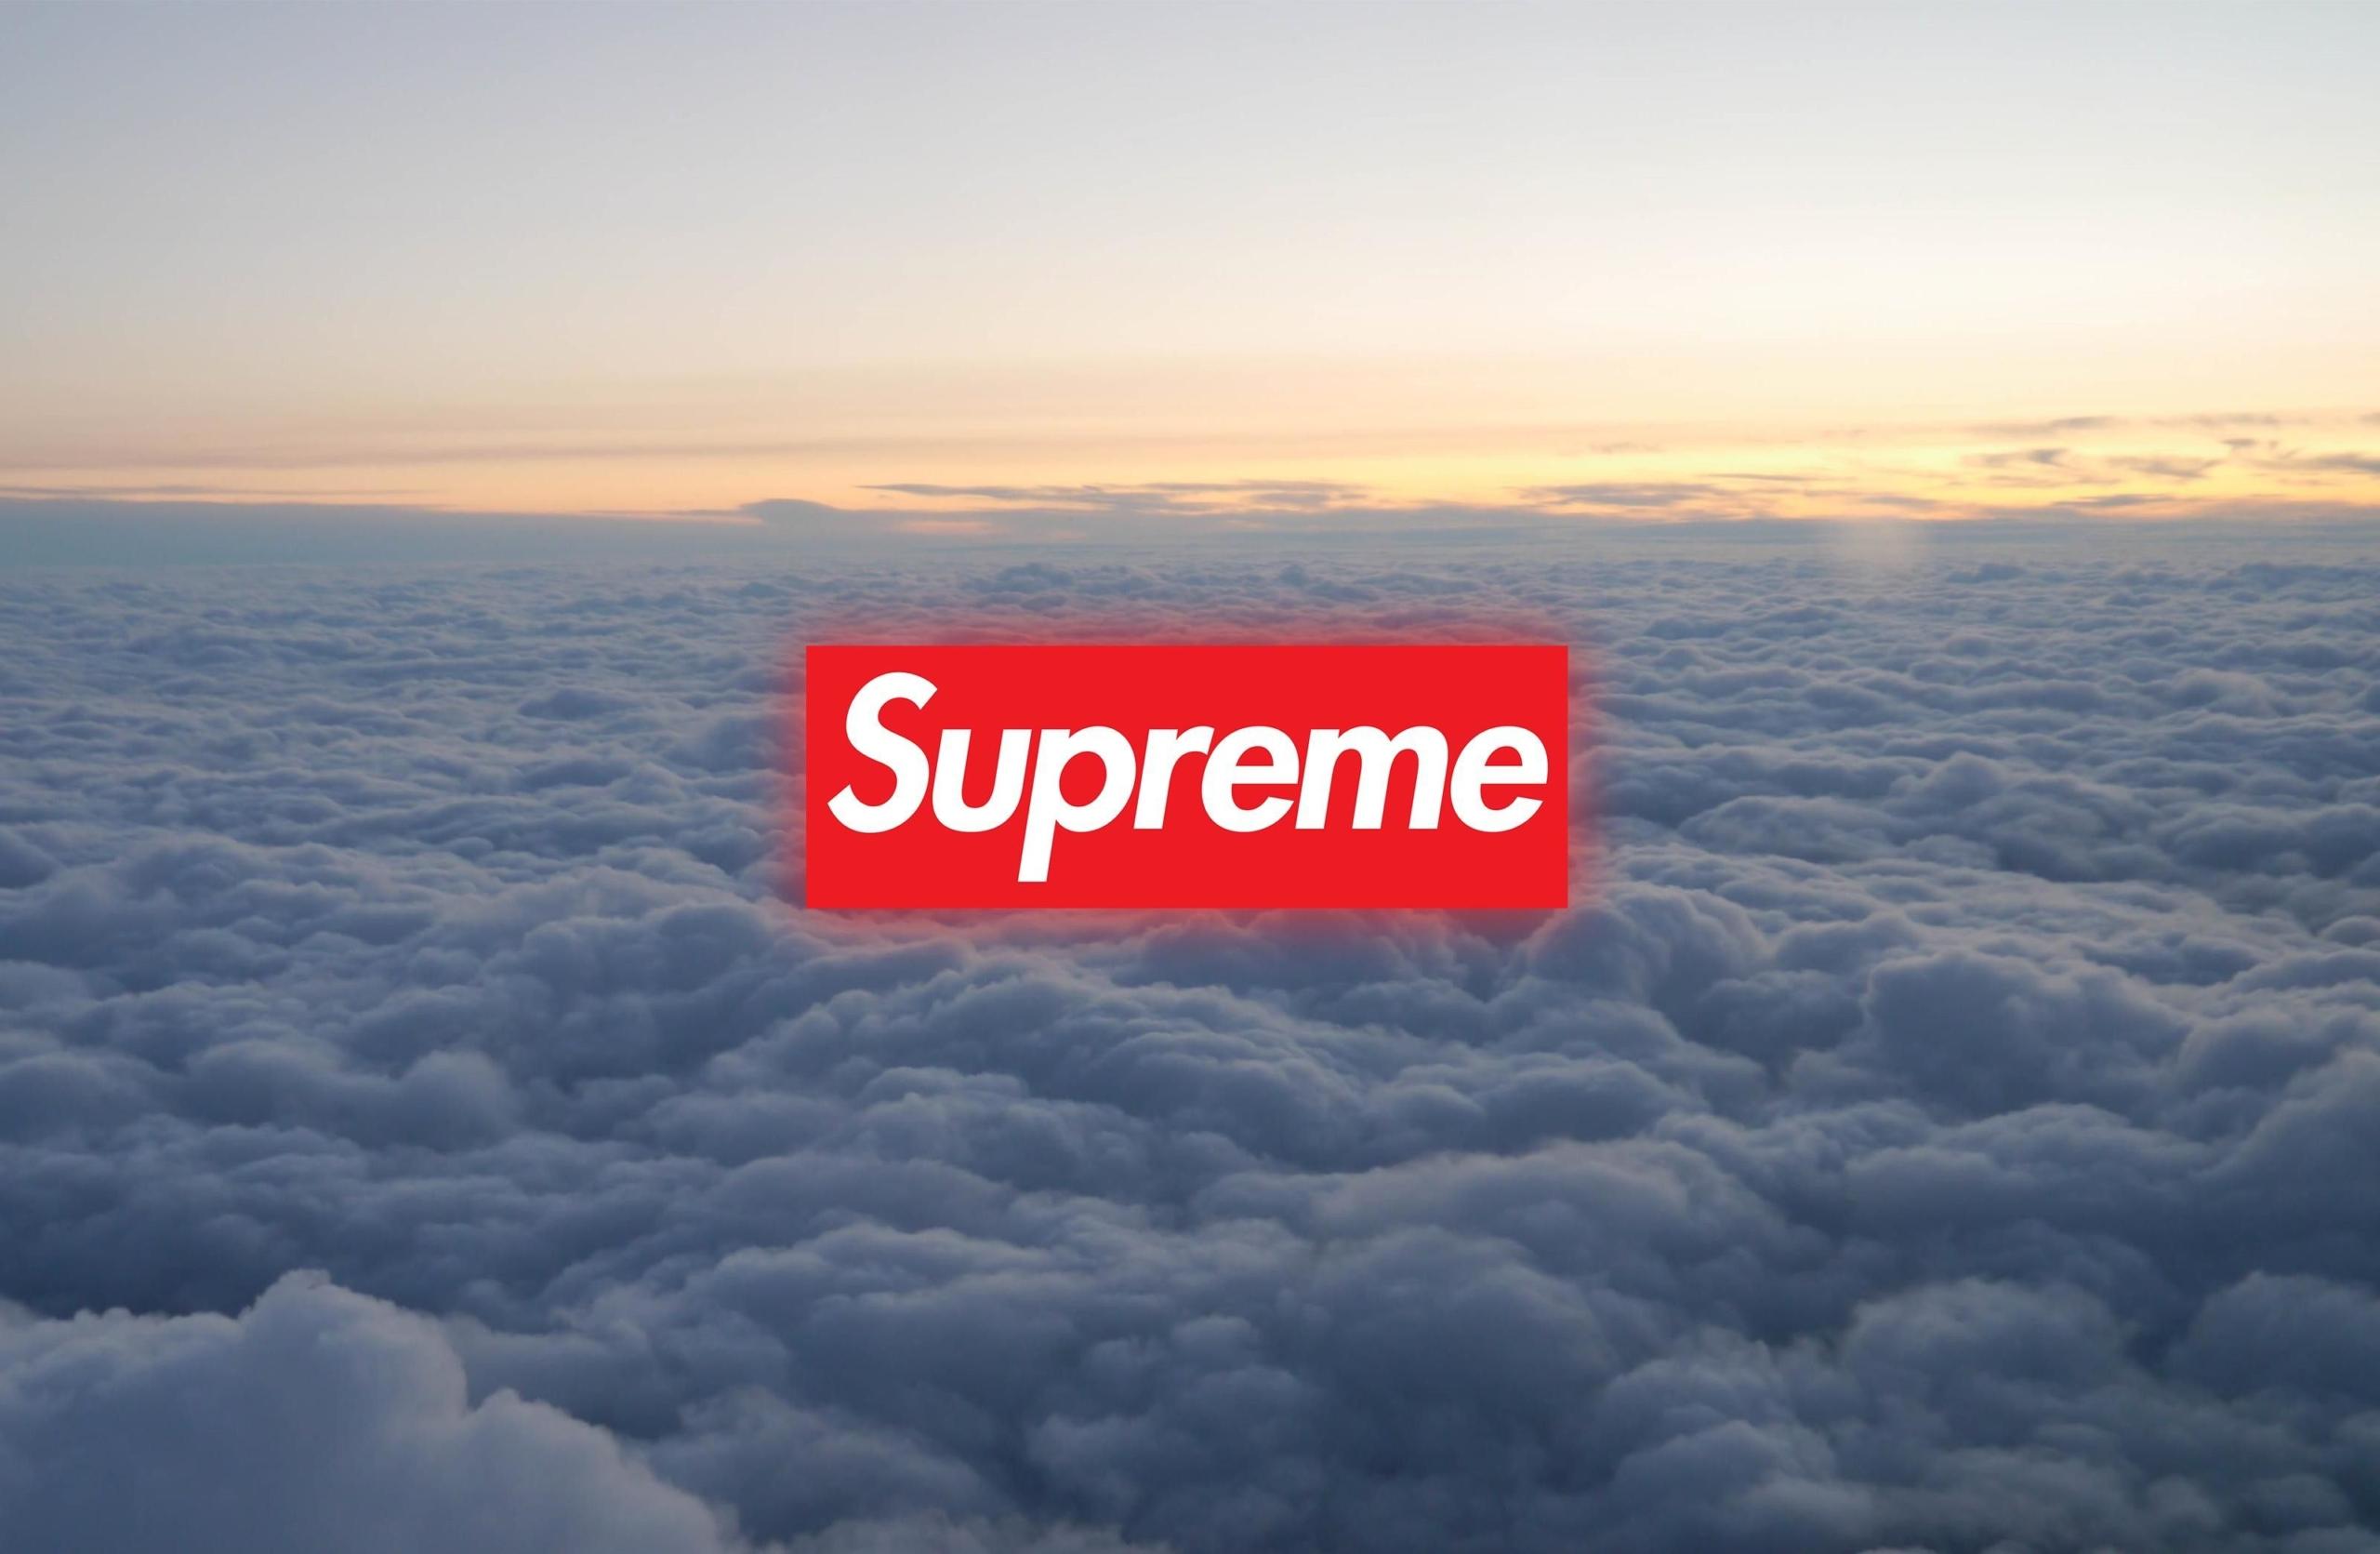 Supreme Wallpaper 4K Ultra HD – A Modern Wallpaper Design